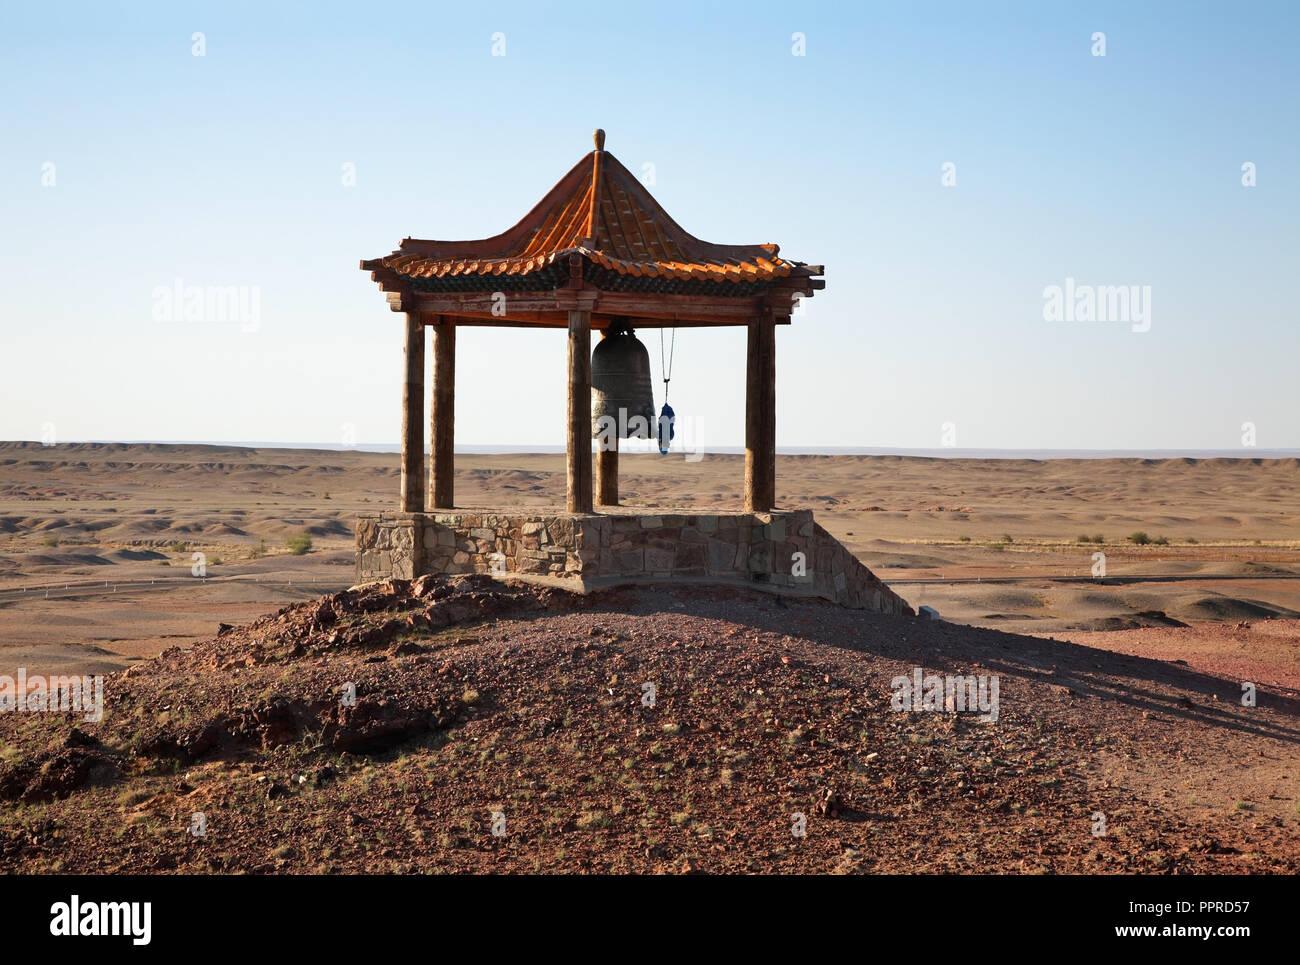 Way to Earth energy center - northern entrance to Shambhala in Gobi desert near Sainshand. Mongolia - Stock Image